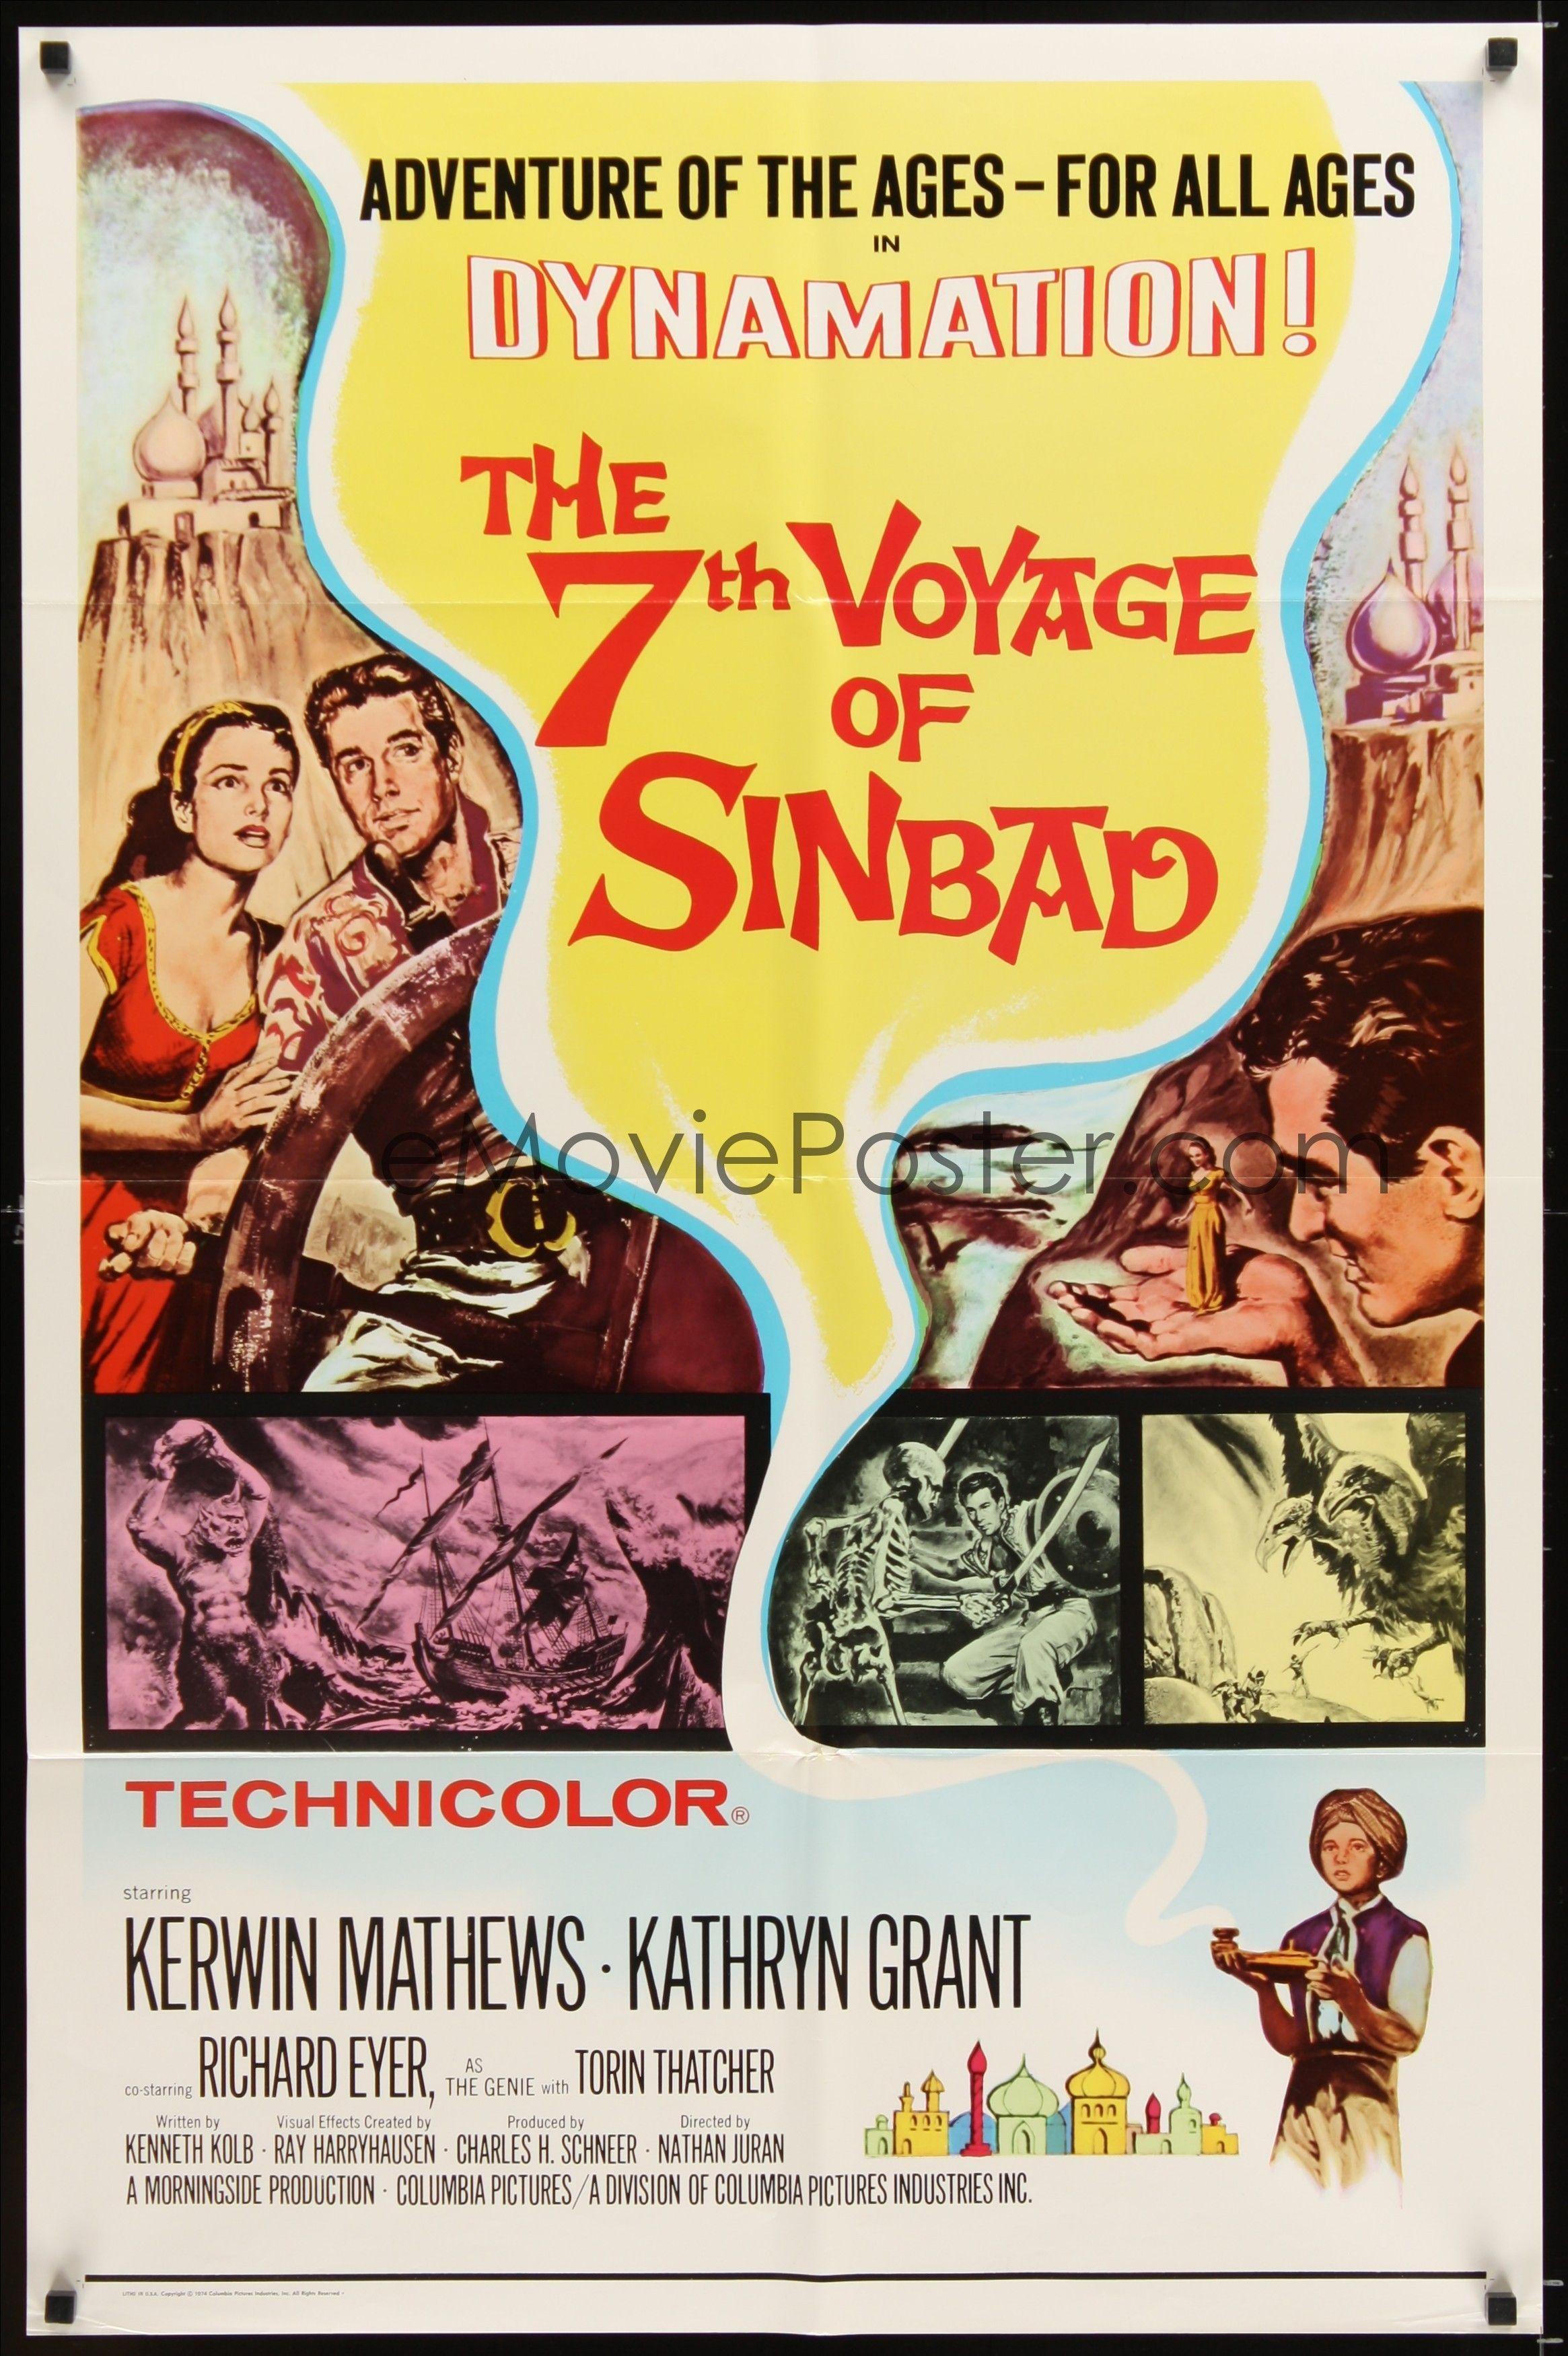 The 7th Voyage of Sinbad Poster////The 7th Voyage of Sinbad Movie Poster////Movie Po